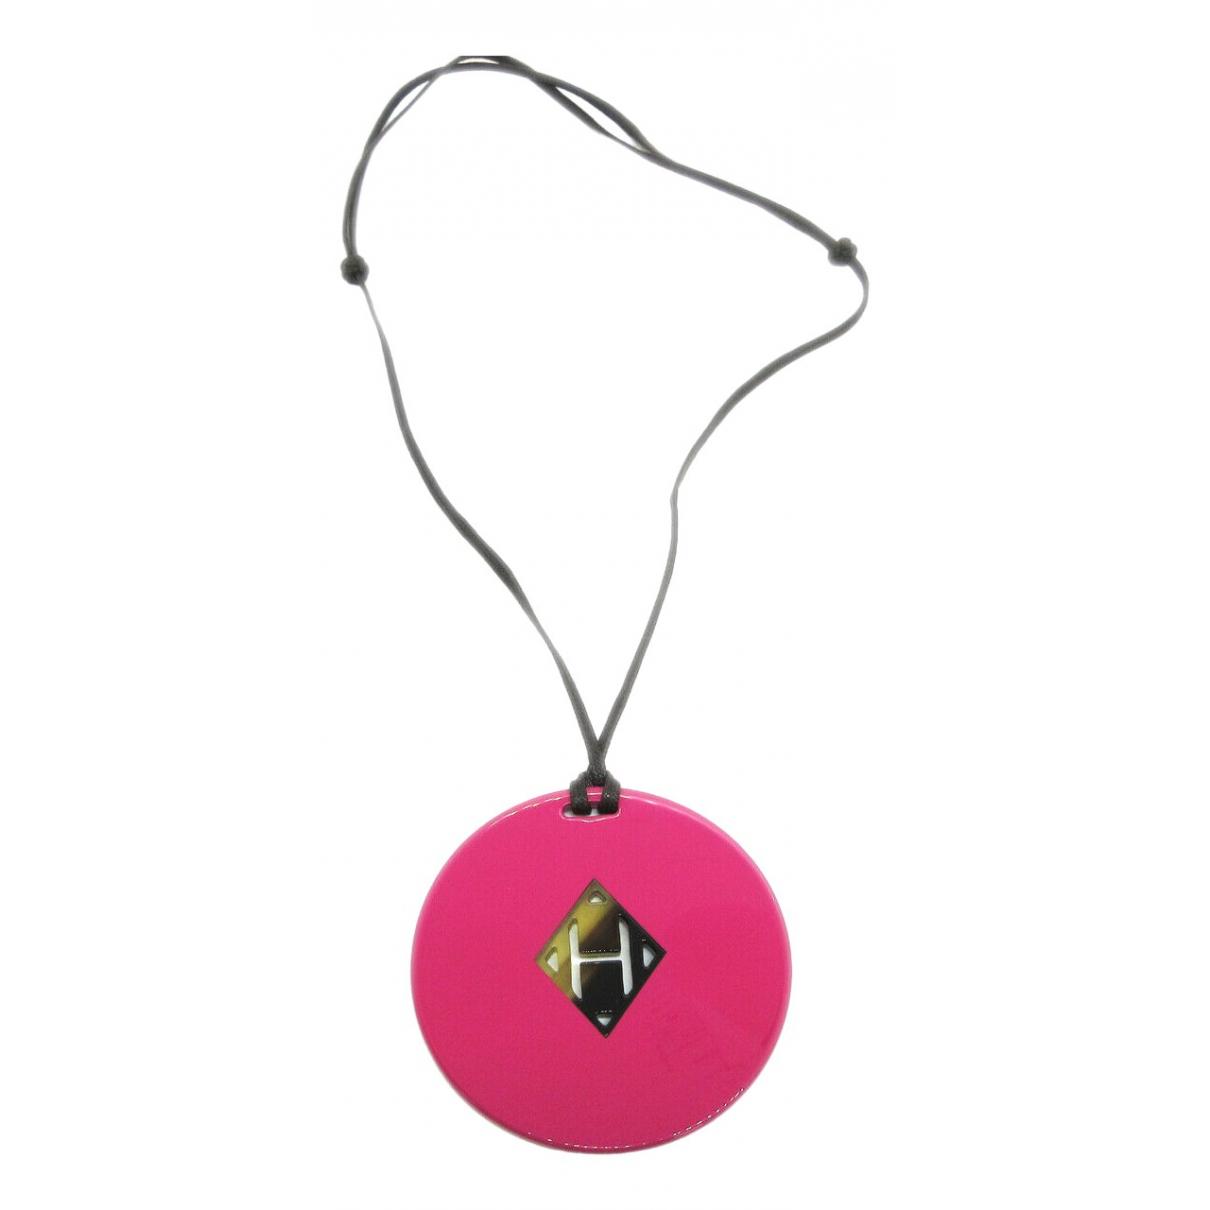 Hermes - Collier   pour femme en metal - rose